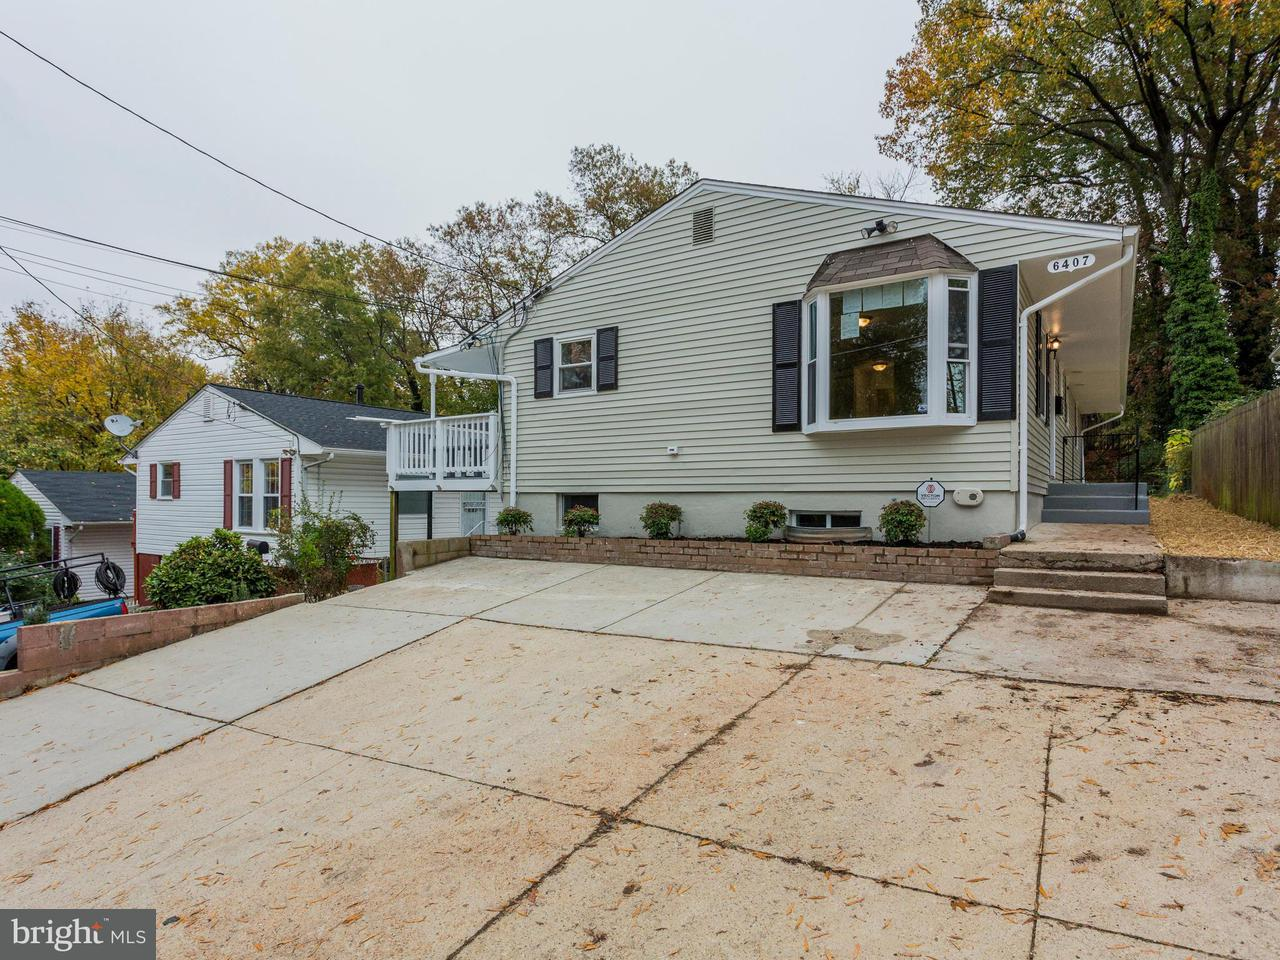 Single Family Home for Sale at 6407 5TH Avenue 6407 5TH Avenue Takoma Park, Maryland 20912 United States